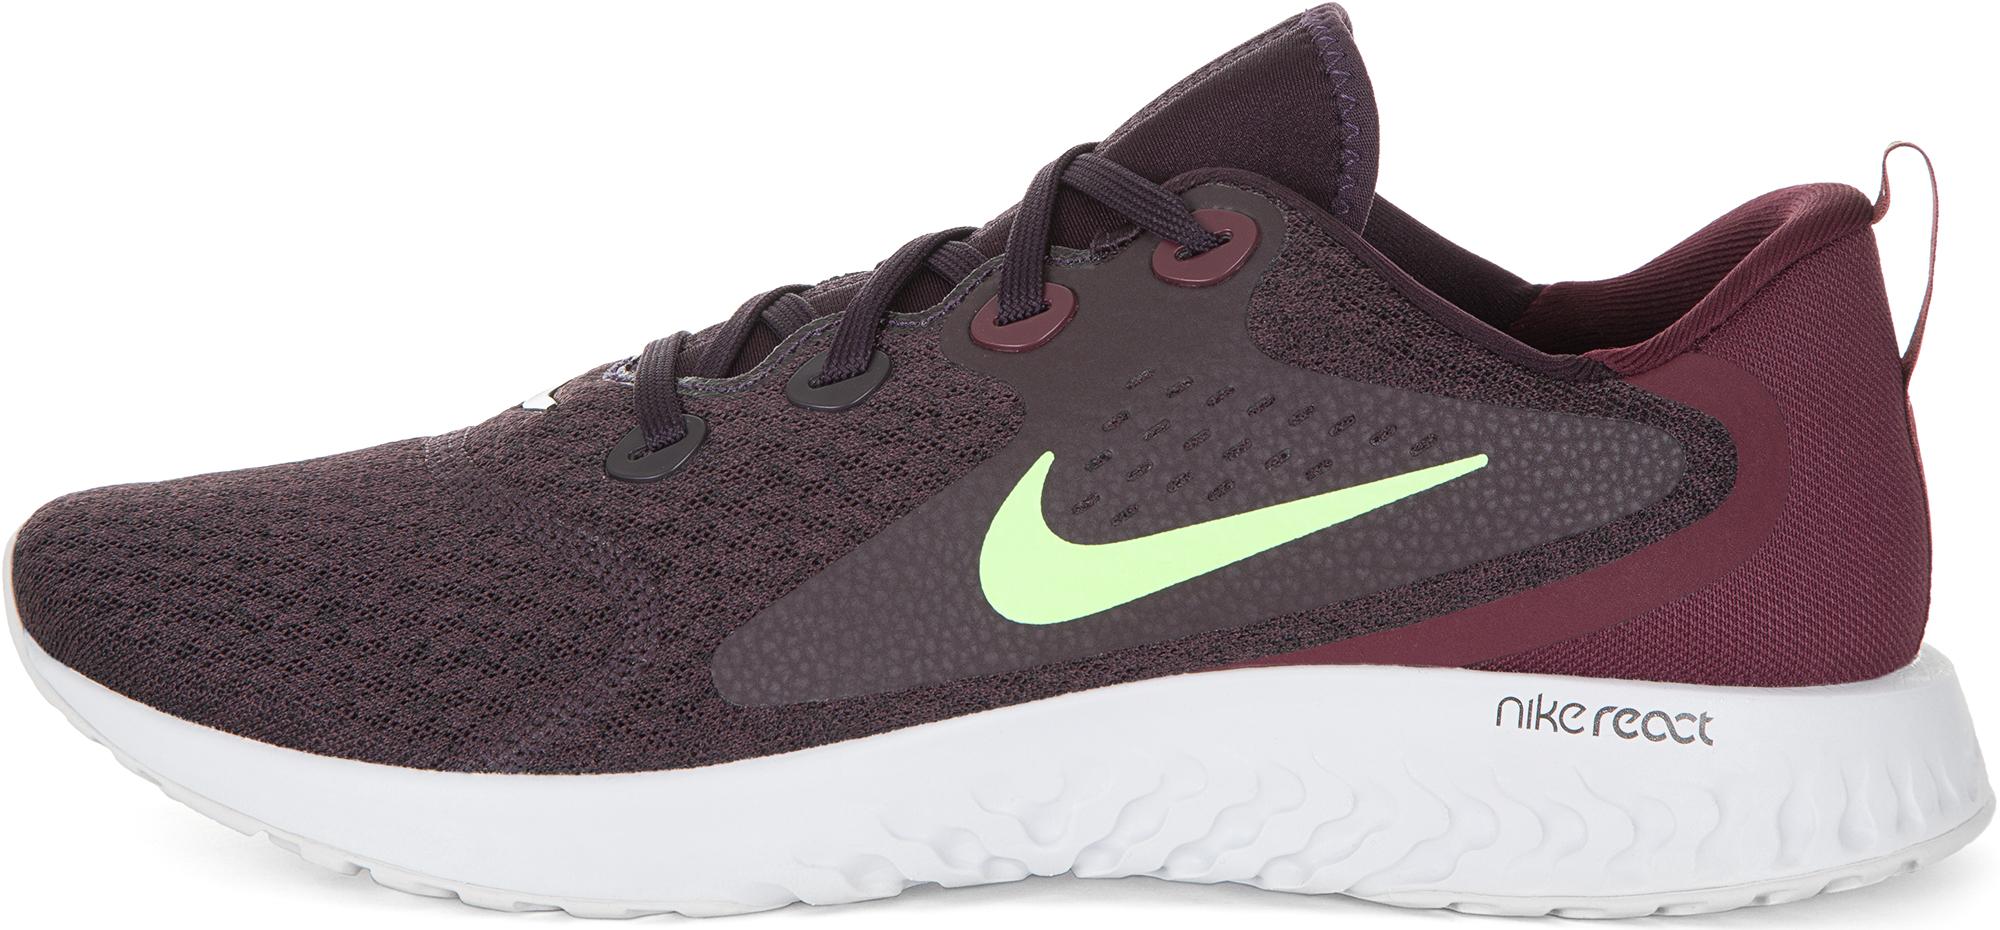 Nike Кроссовки мужские Nike Legend React, размер 44 цена